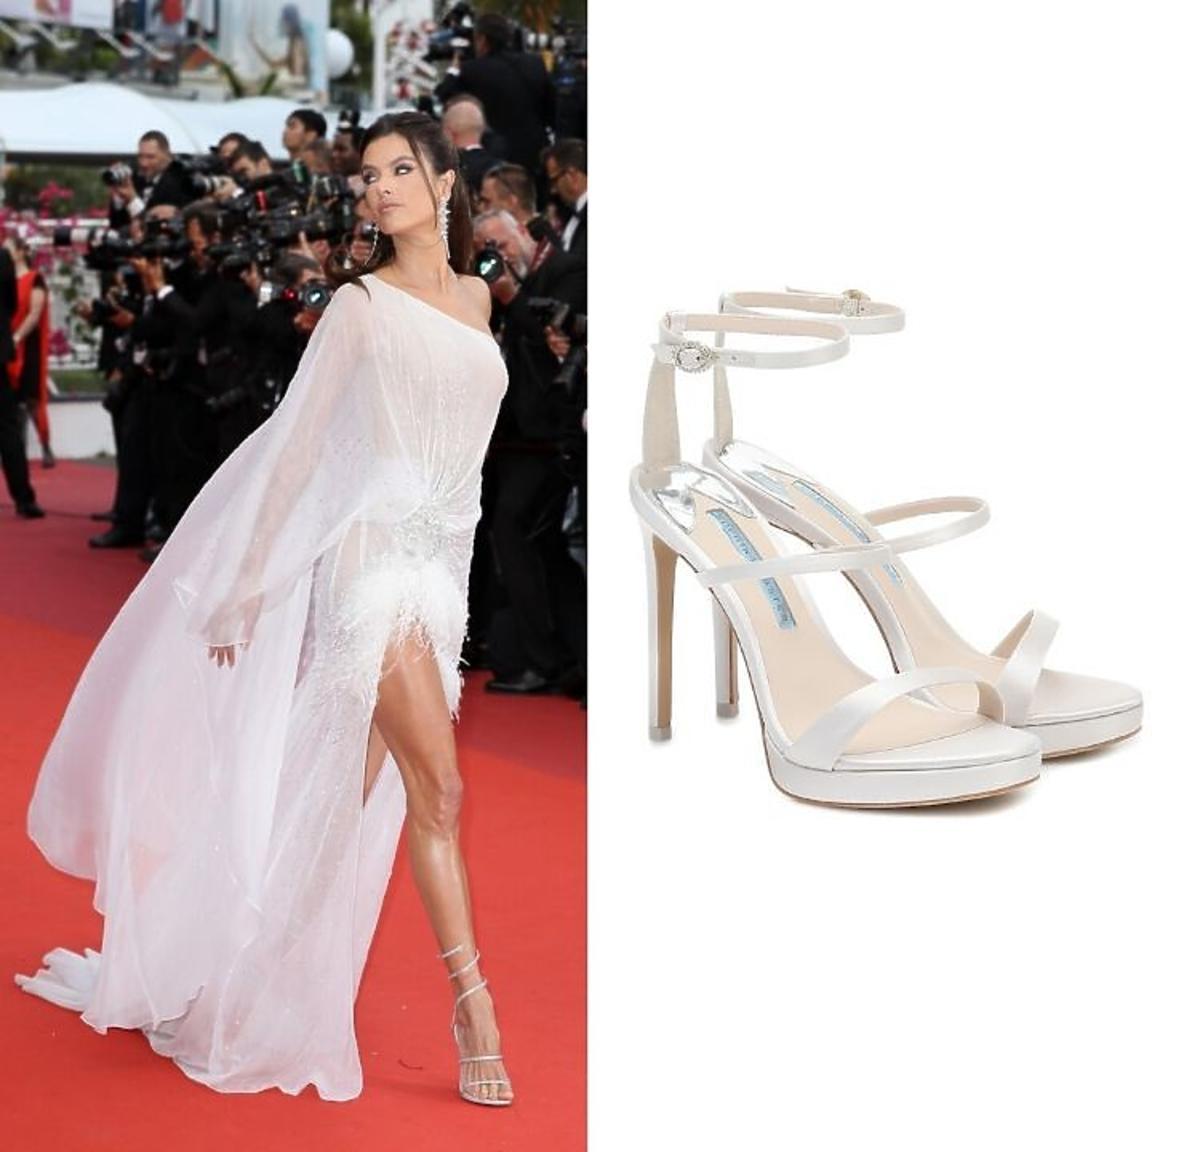 Alessandra Ambrosio ślubne buty trendy 2020 Sophia Webster/ Moliera 2